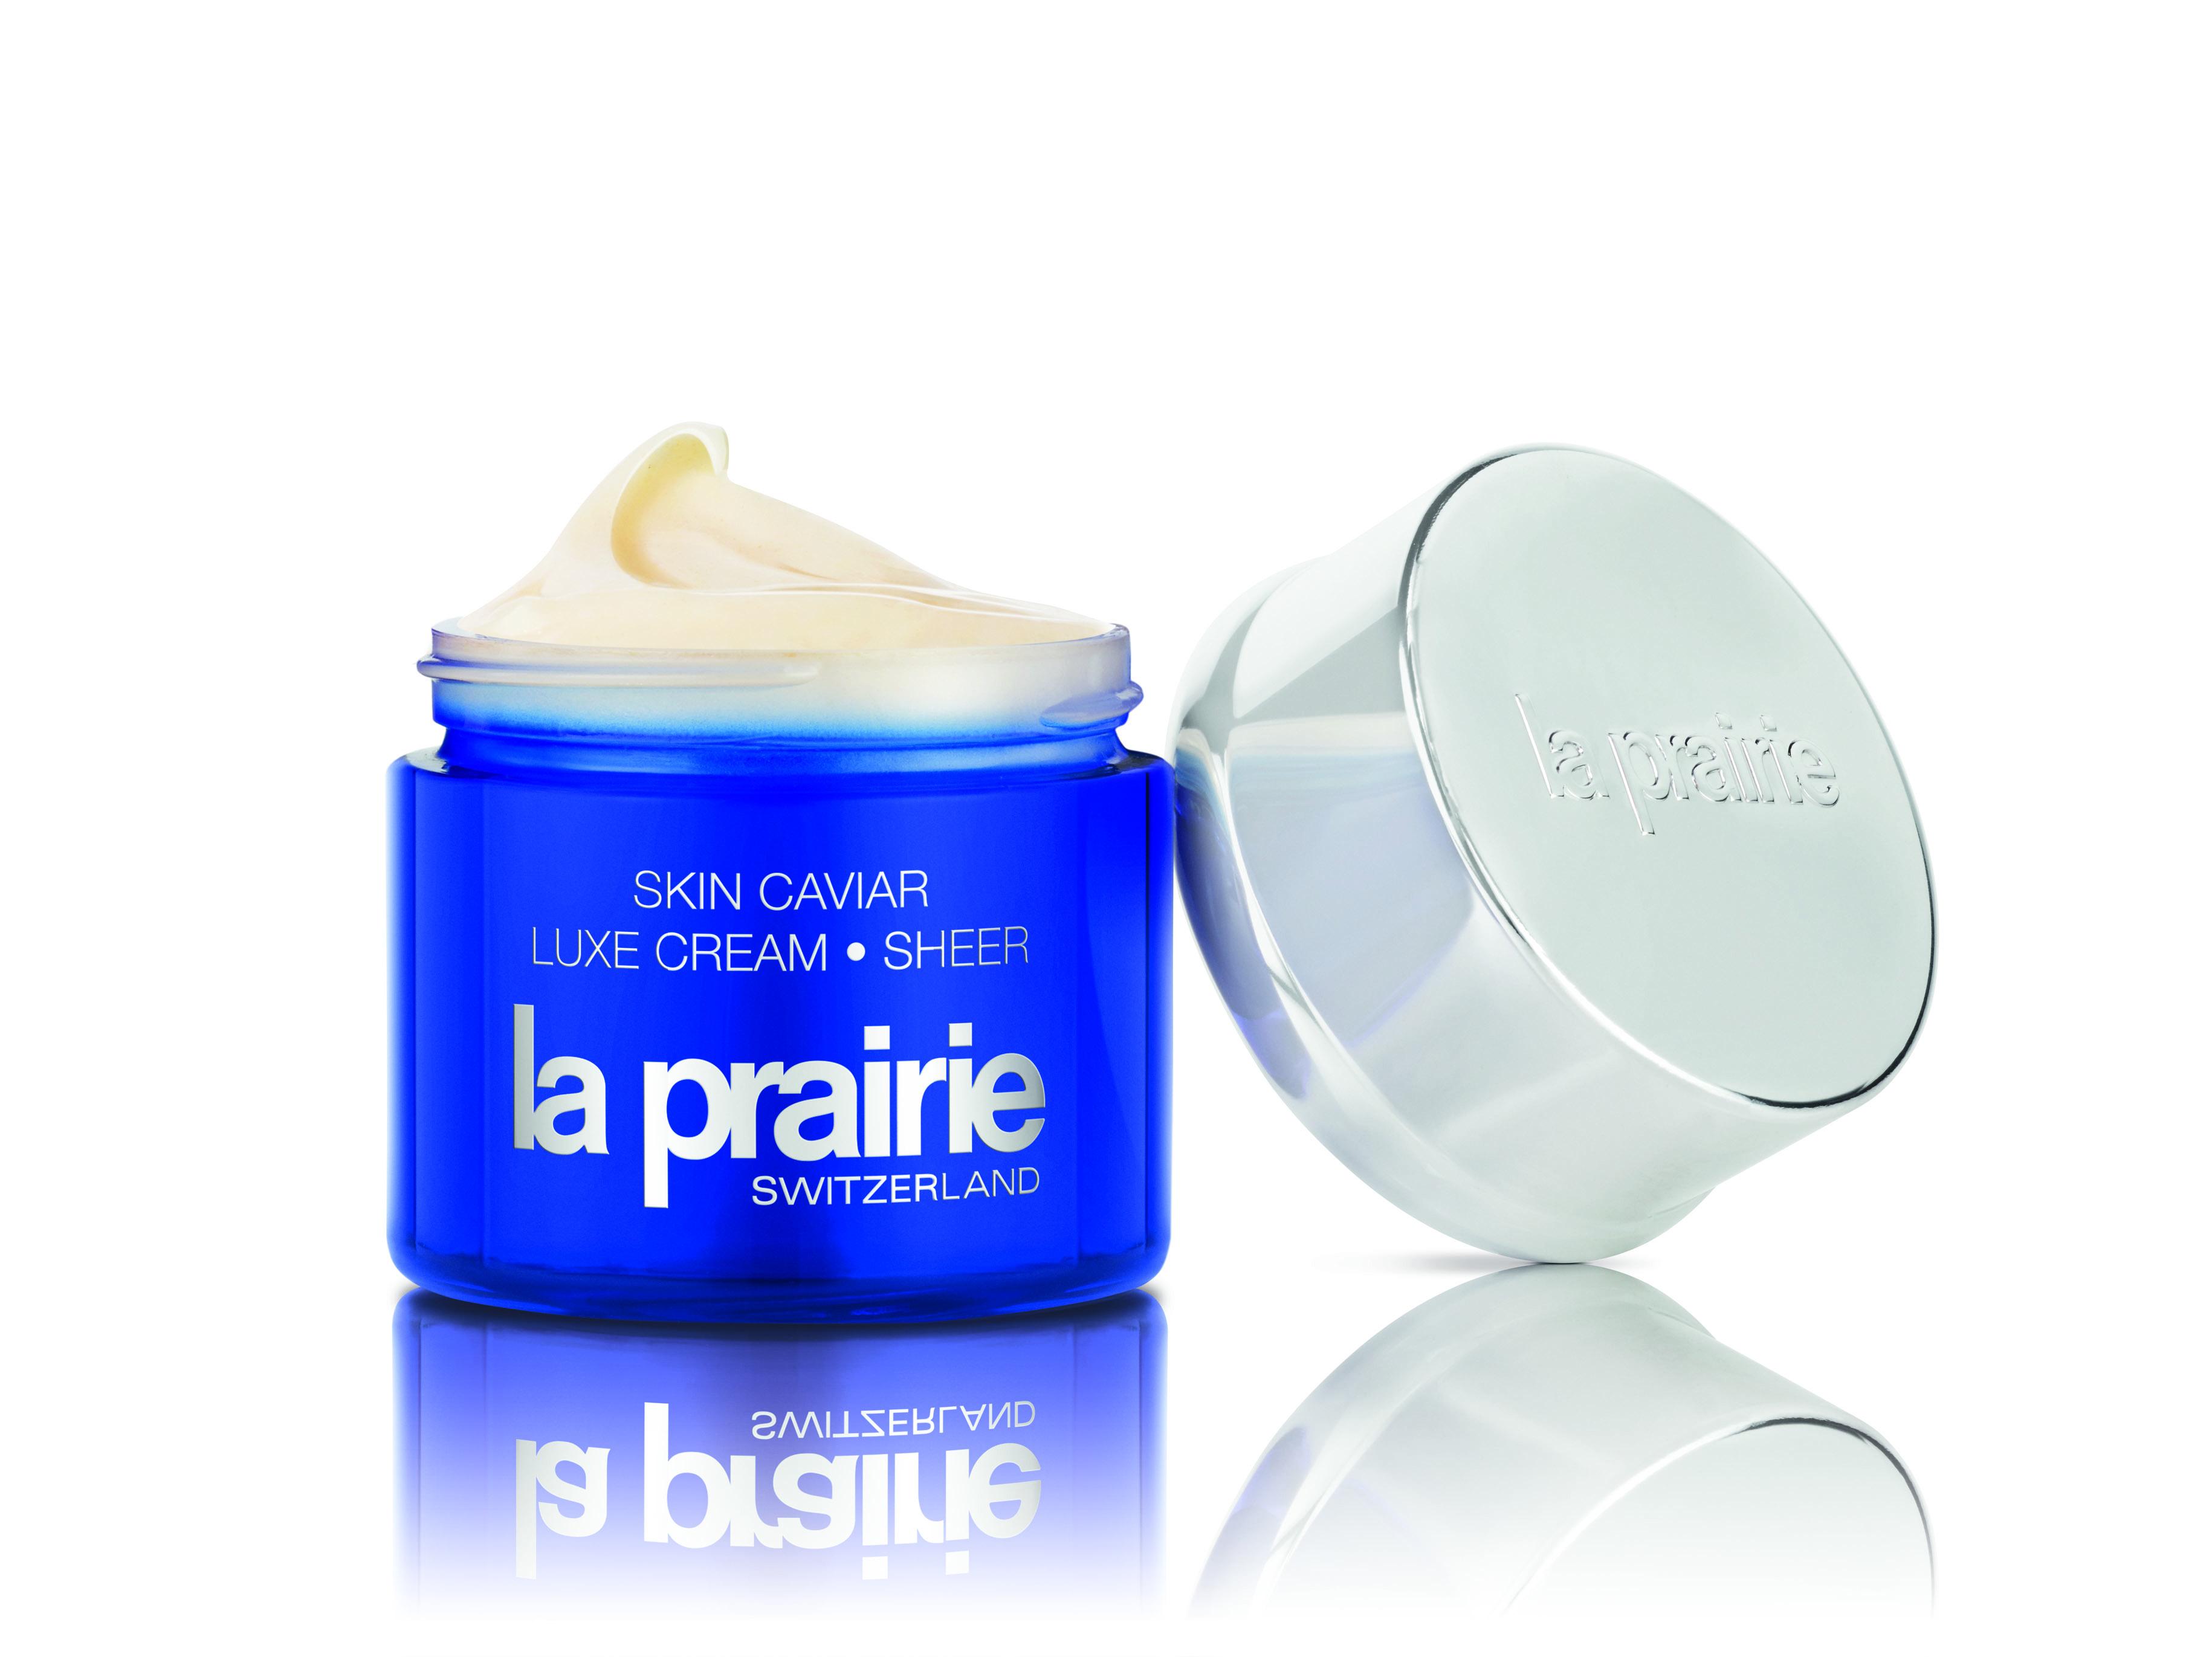 La Prairie Skin Caviar  Luxe Cream Sheer Blue